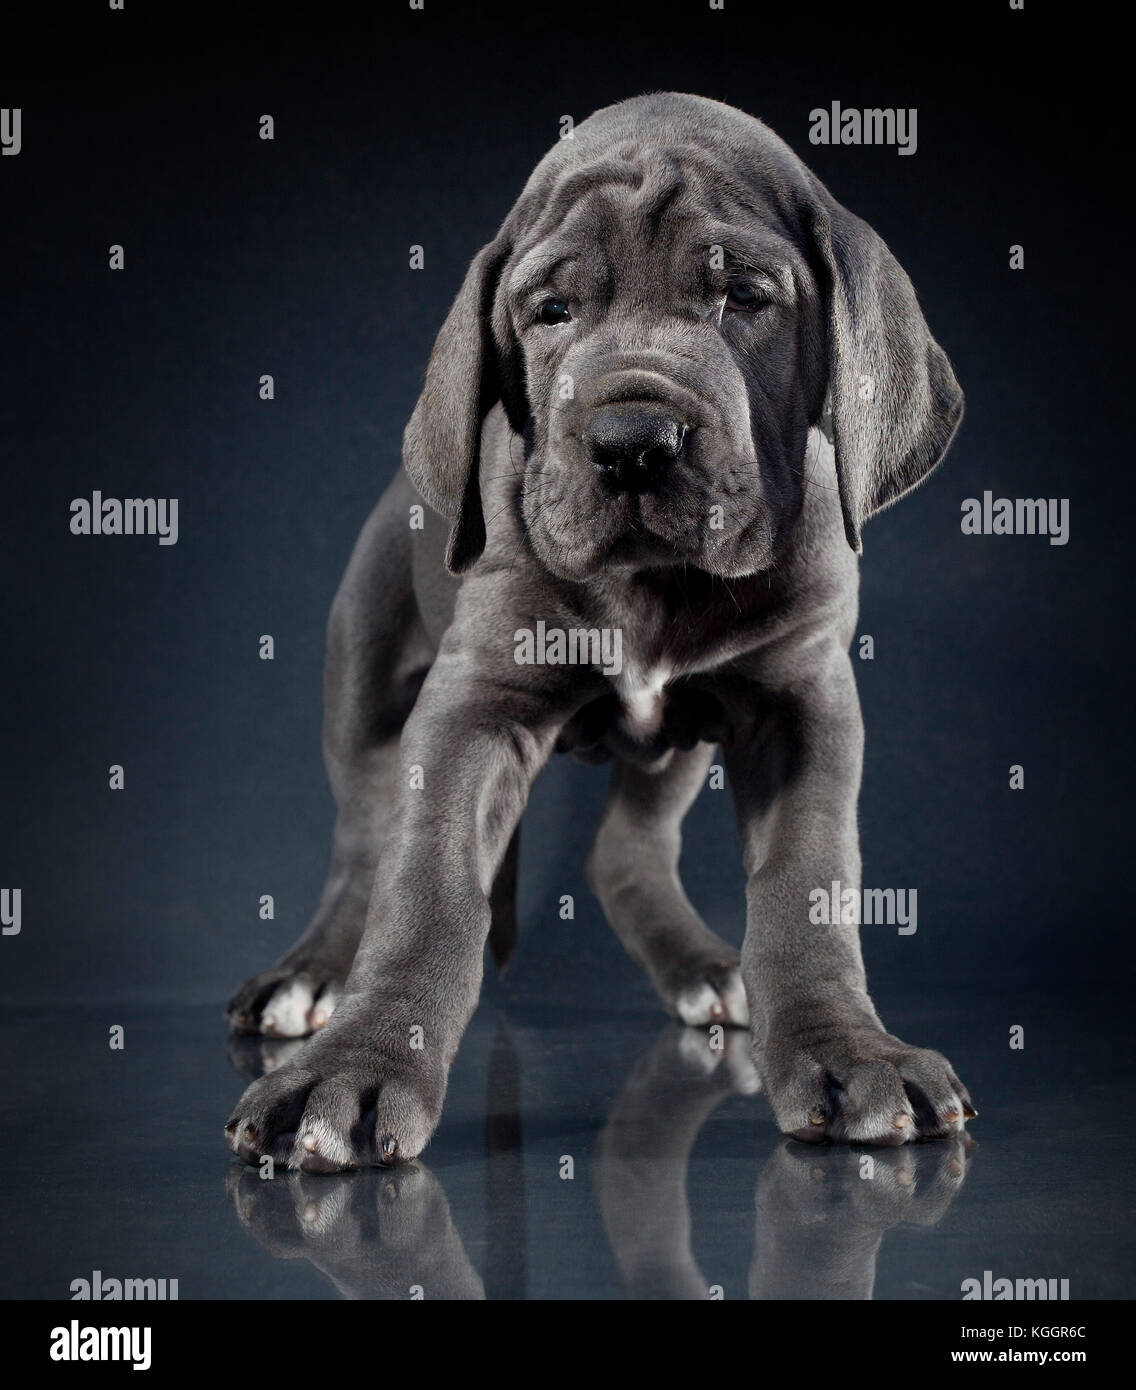 Great Dane Puppy Purebred Standing On A Dark Background Stock Photo Alamy